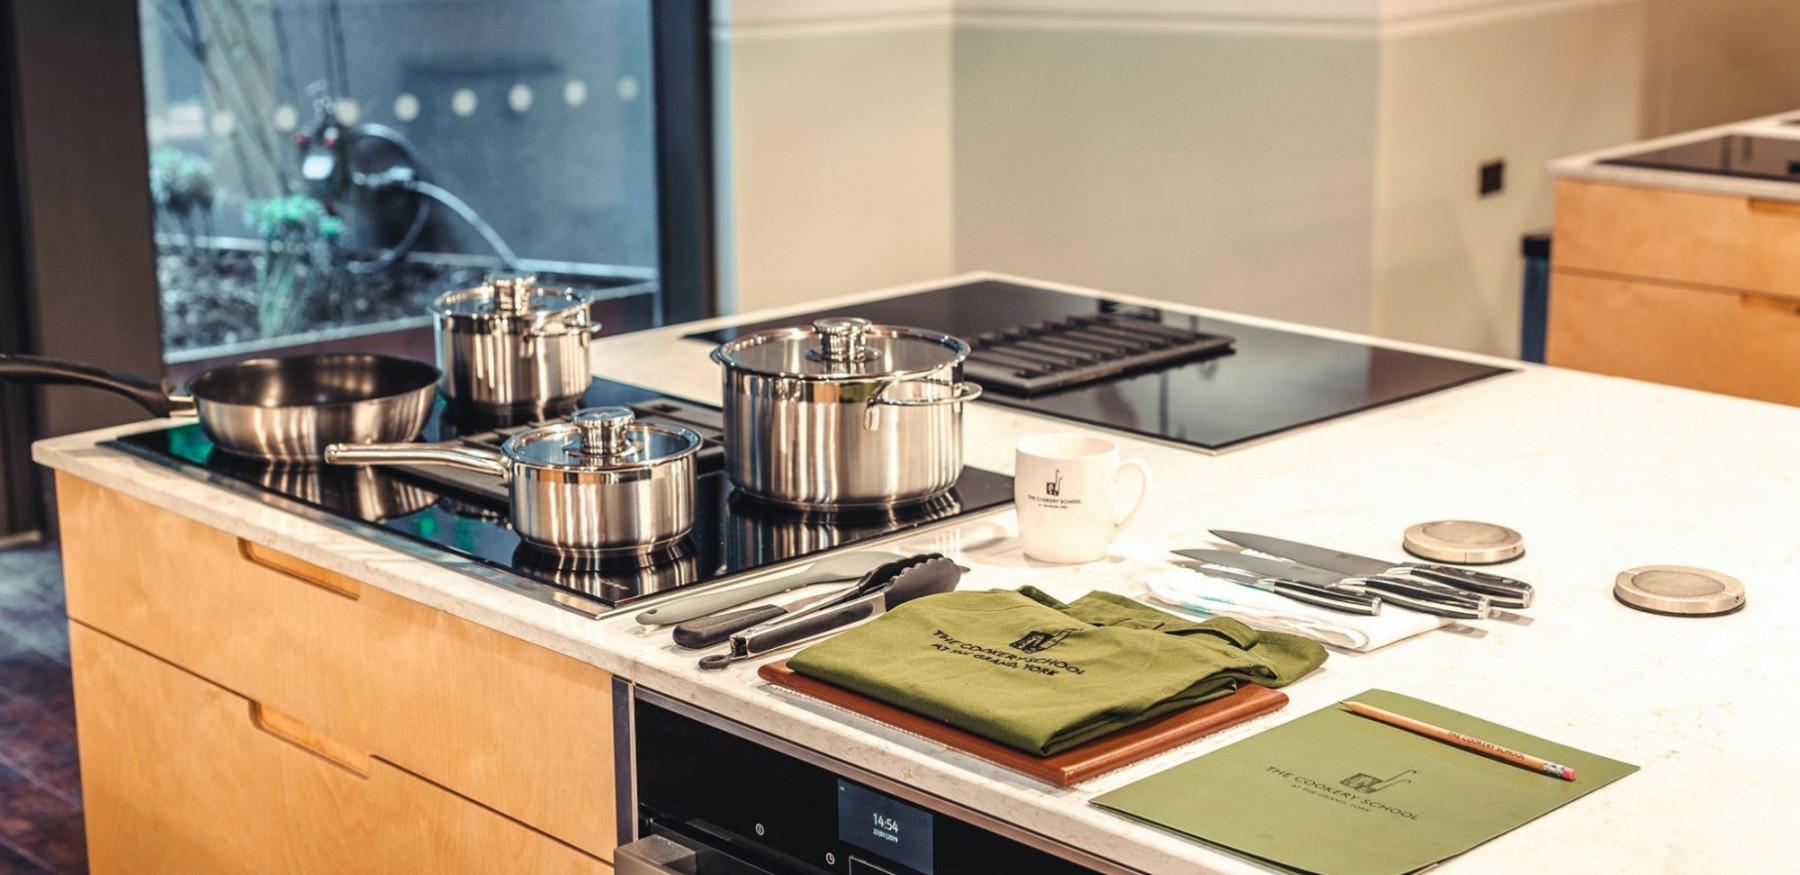 Cook school individual kitchen set up 3 625817155